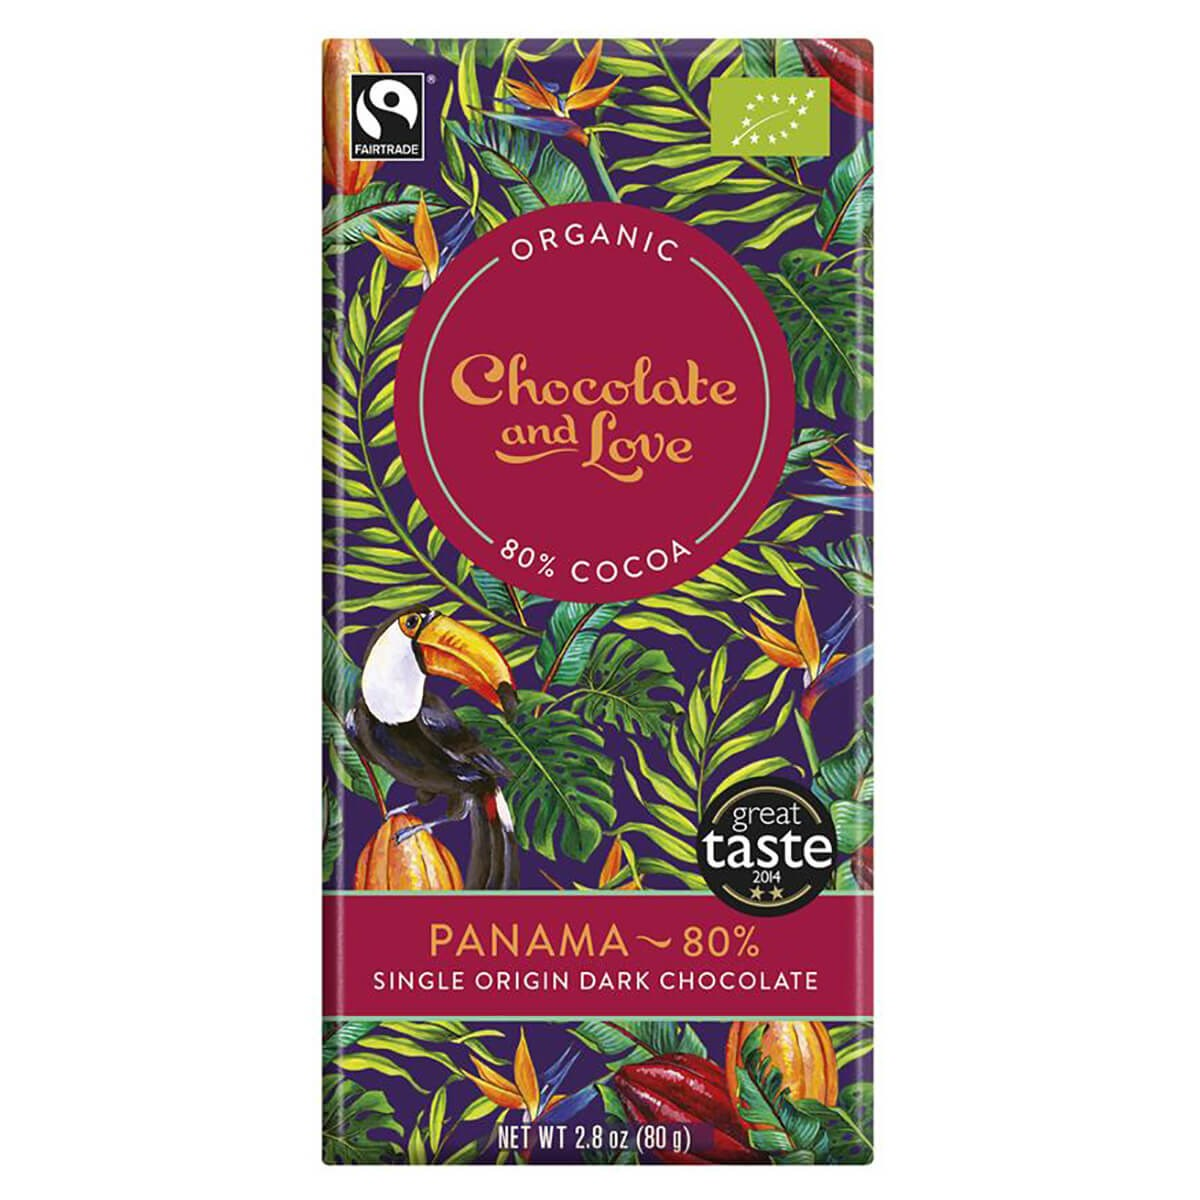 Chocolate and Love Organic & Fairtrade 80% Extra Dark Panama Chocolate